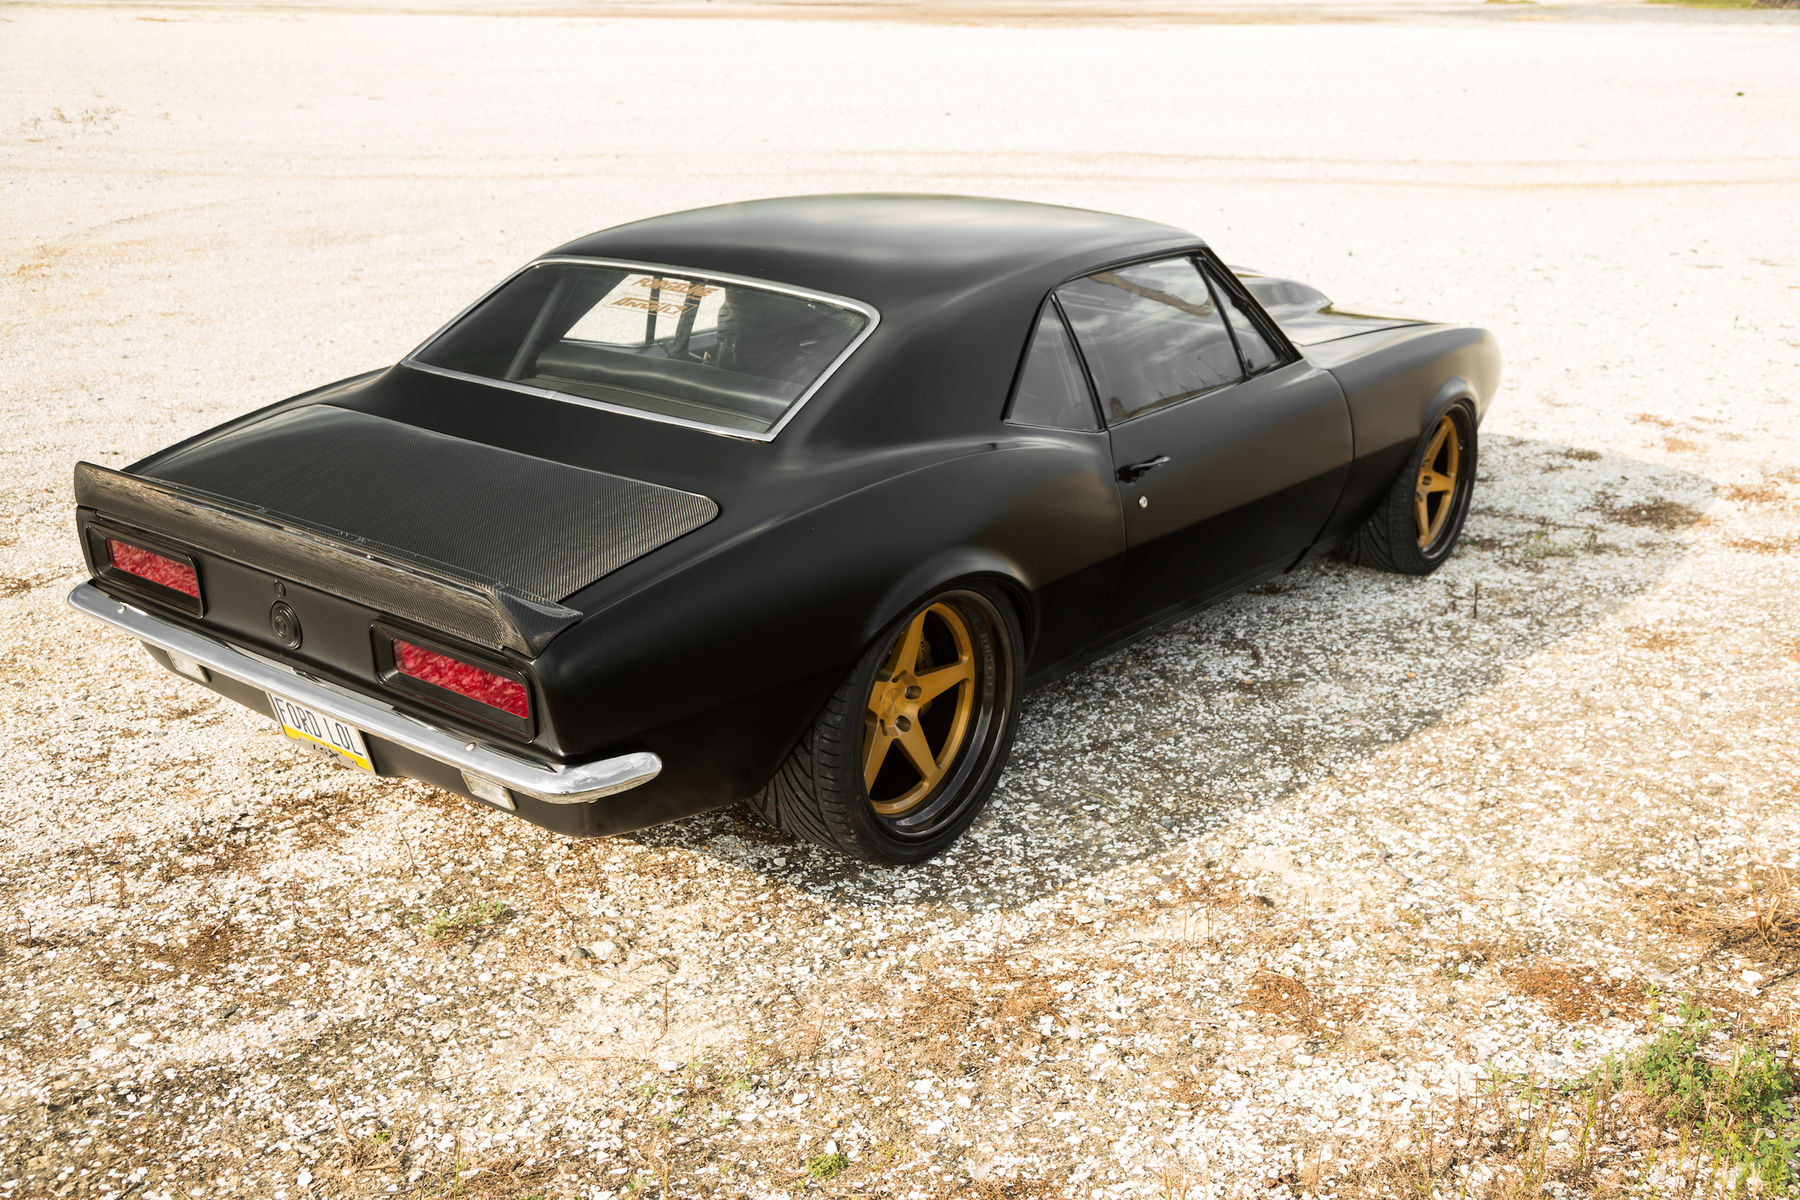 1967 Chevrolet Camaro | Steve Hummel's '67 Camaro on Forgeline FF3C Concave Wheels